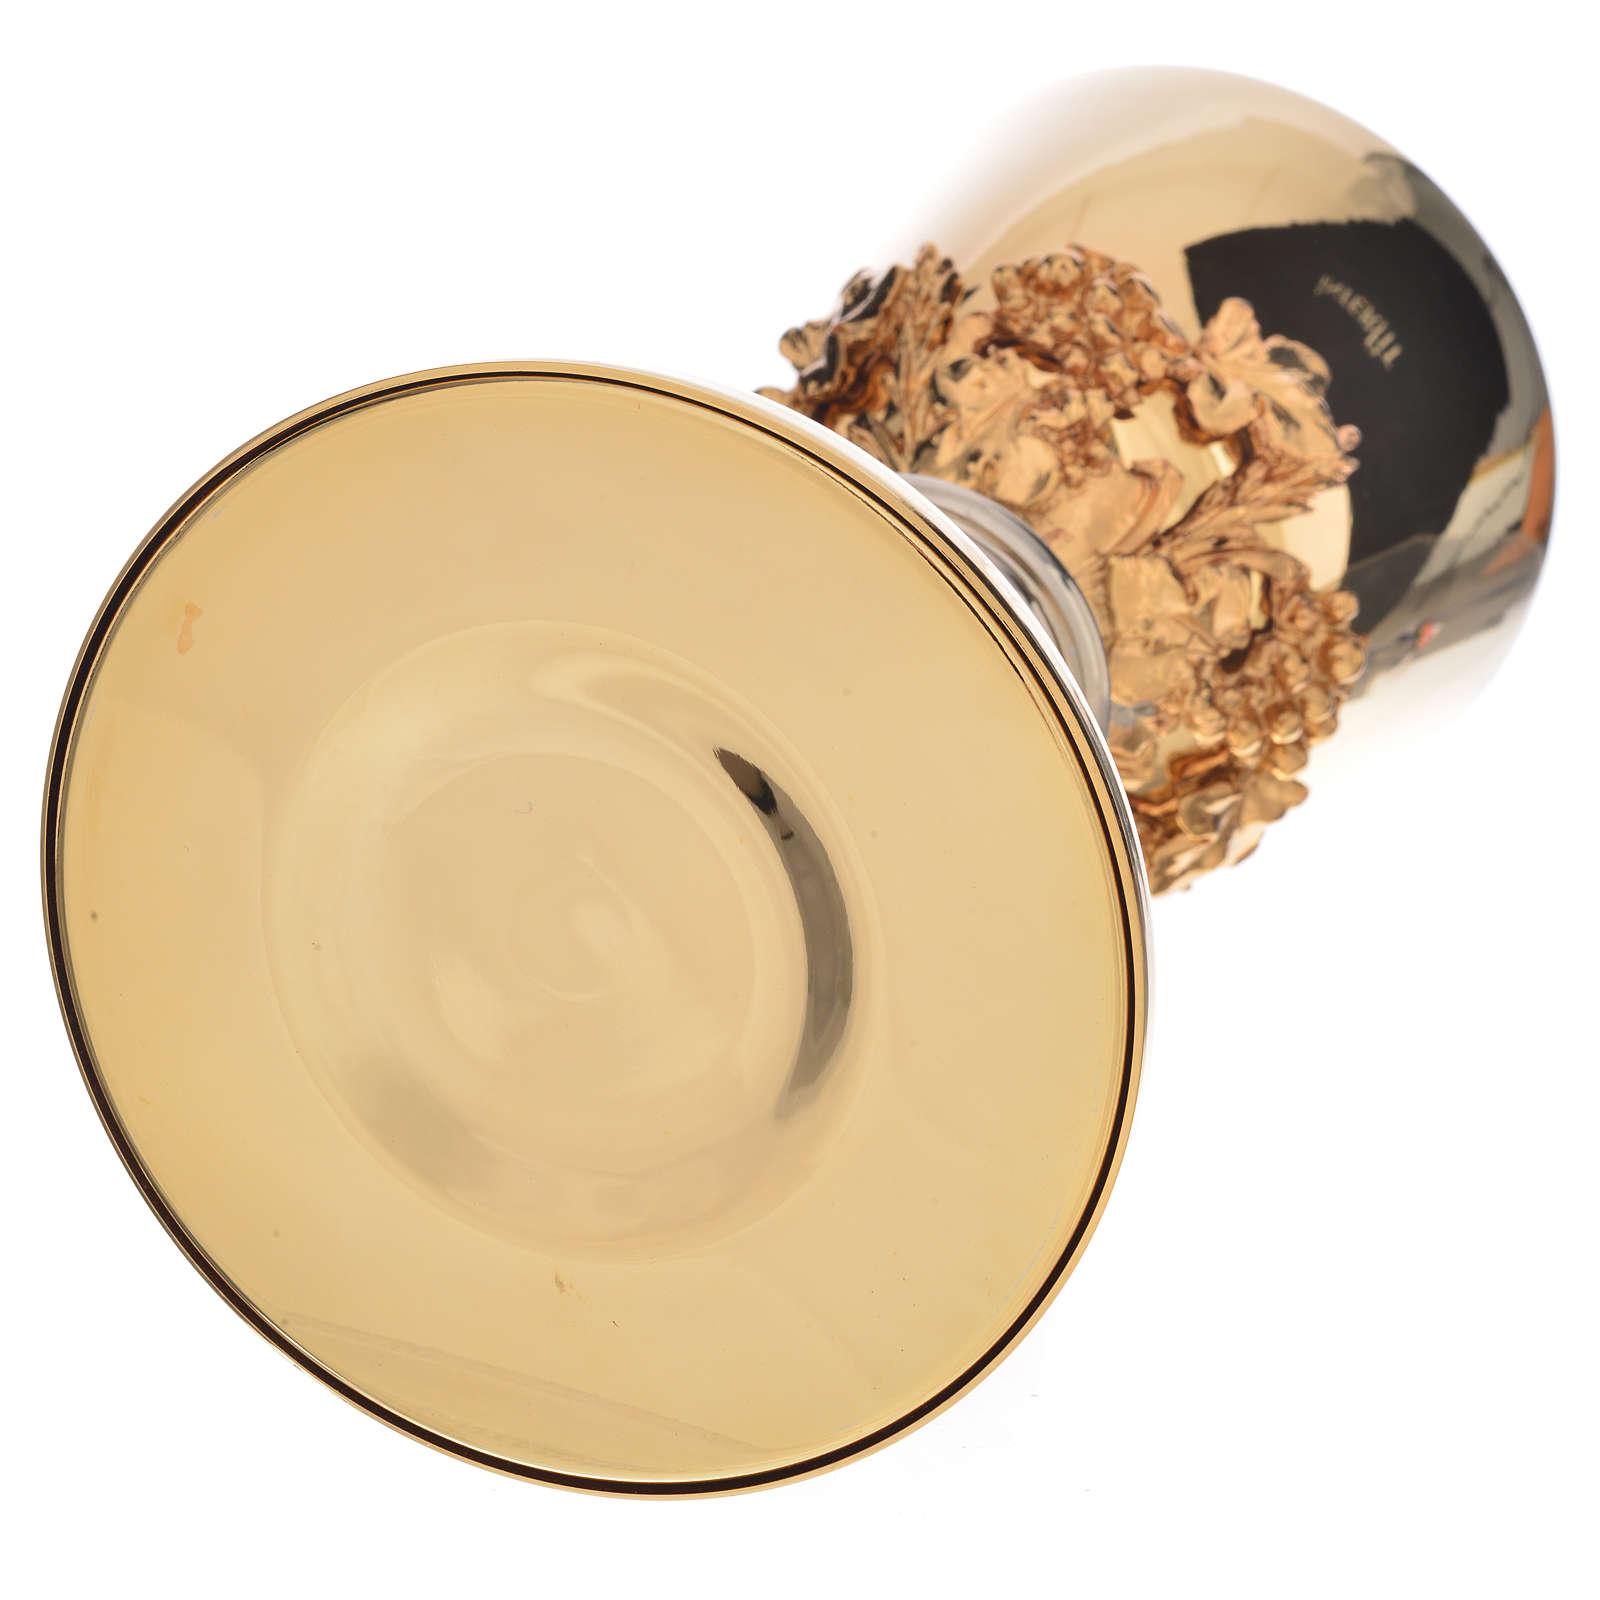 Calice fodera uva base spighe ottone dorato 4